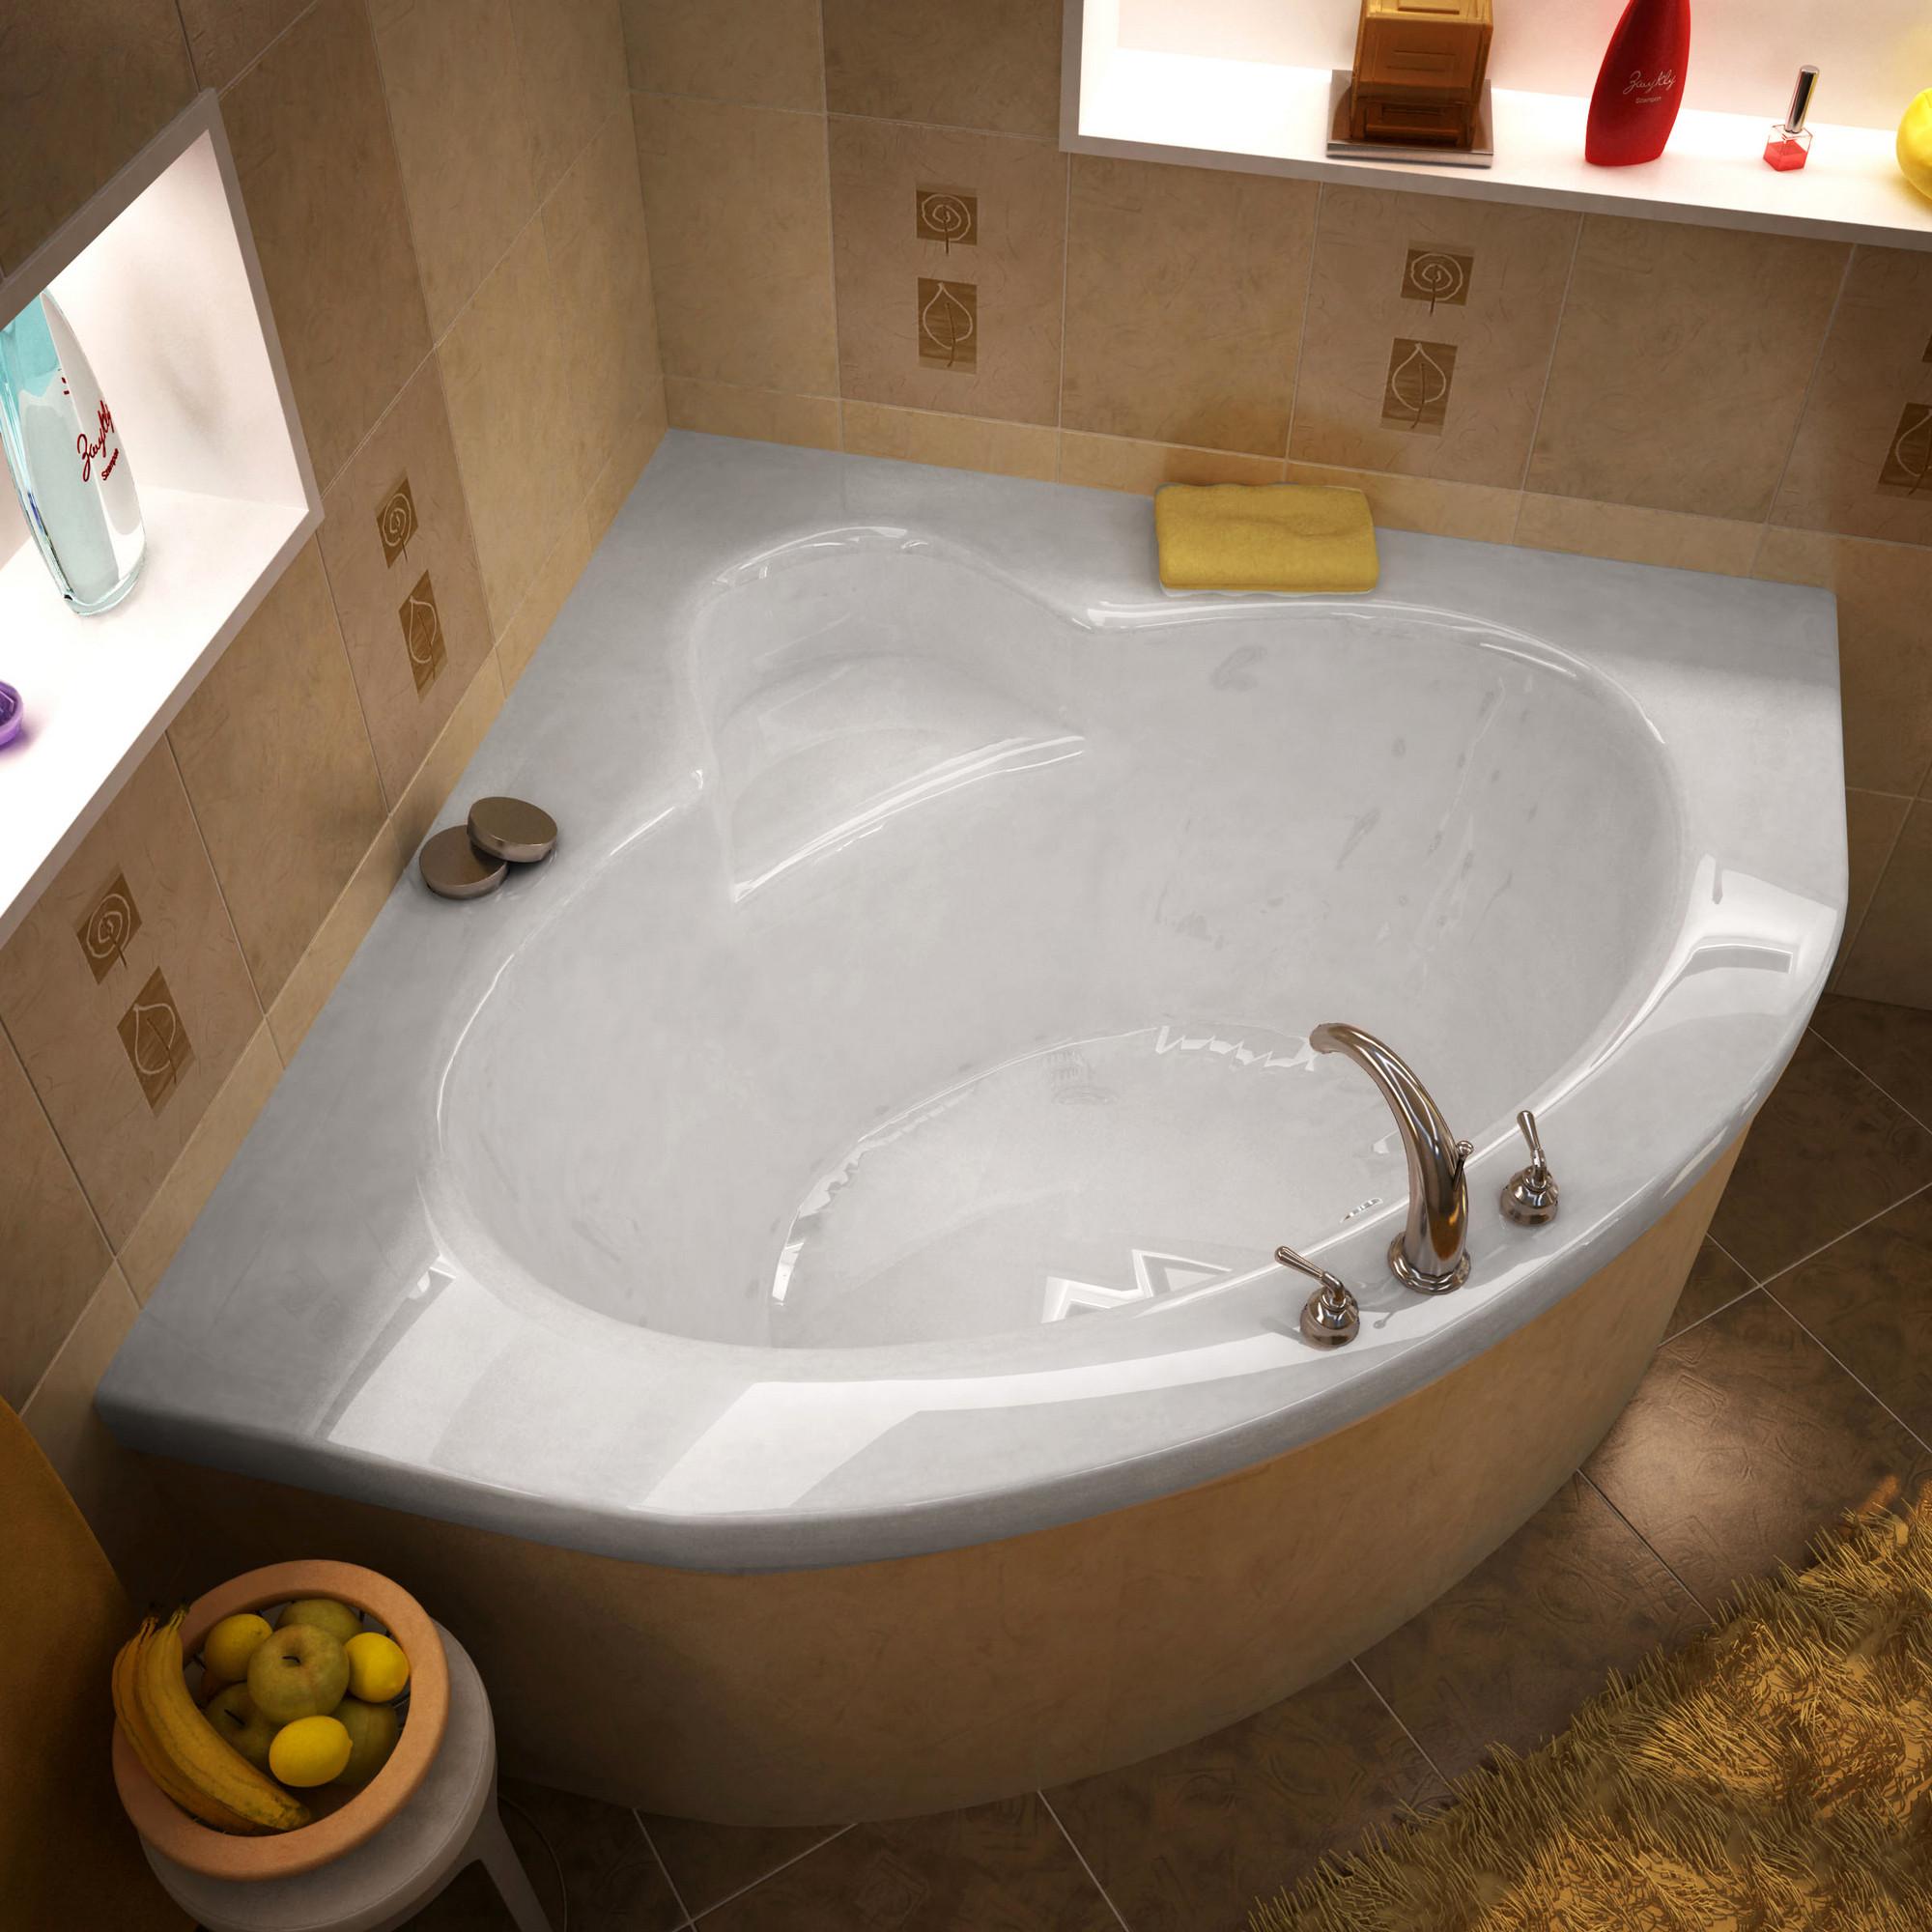 MediTub 6060A Atlantis Alexandria Corner Triangular Acrylic Soaking Bathtub